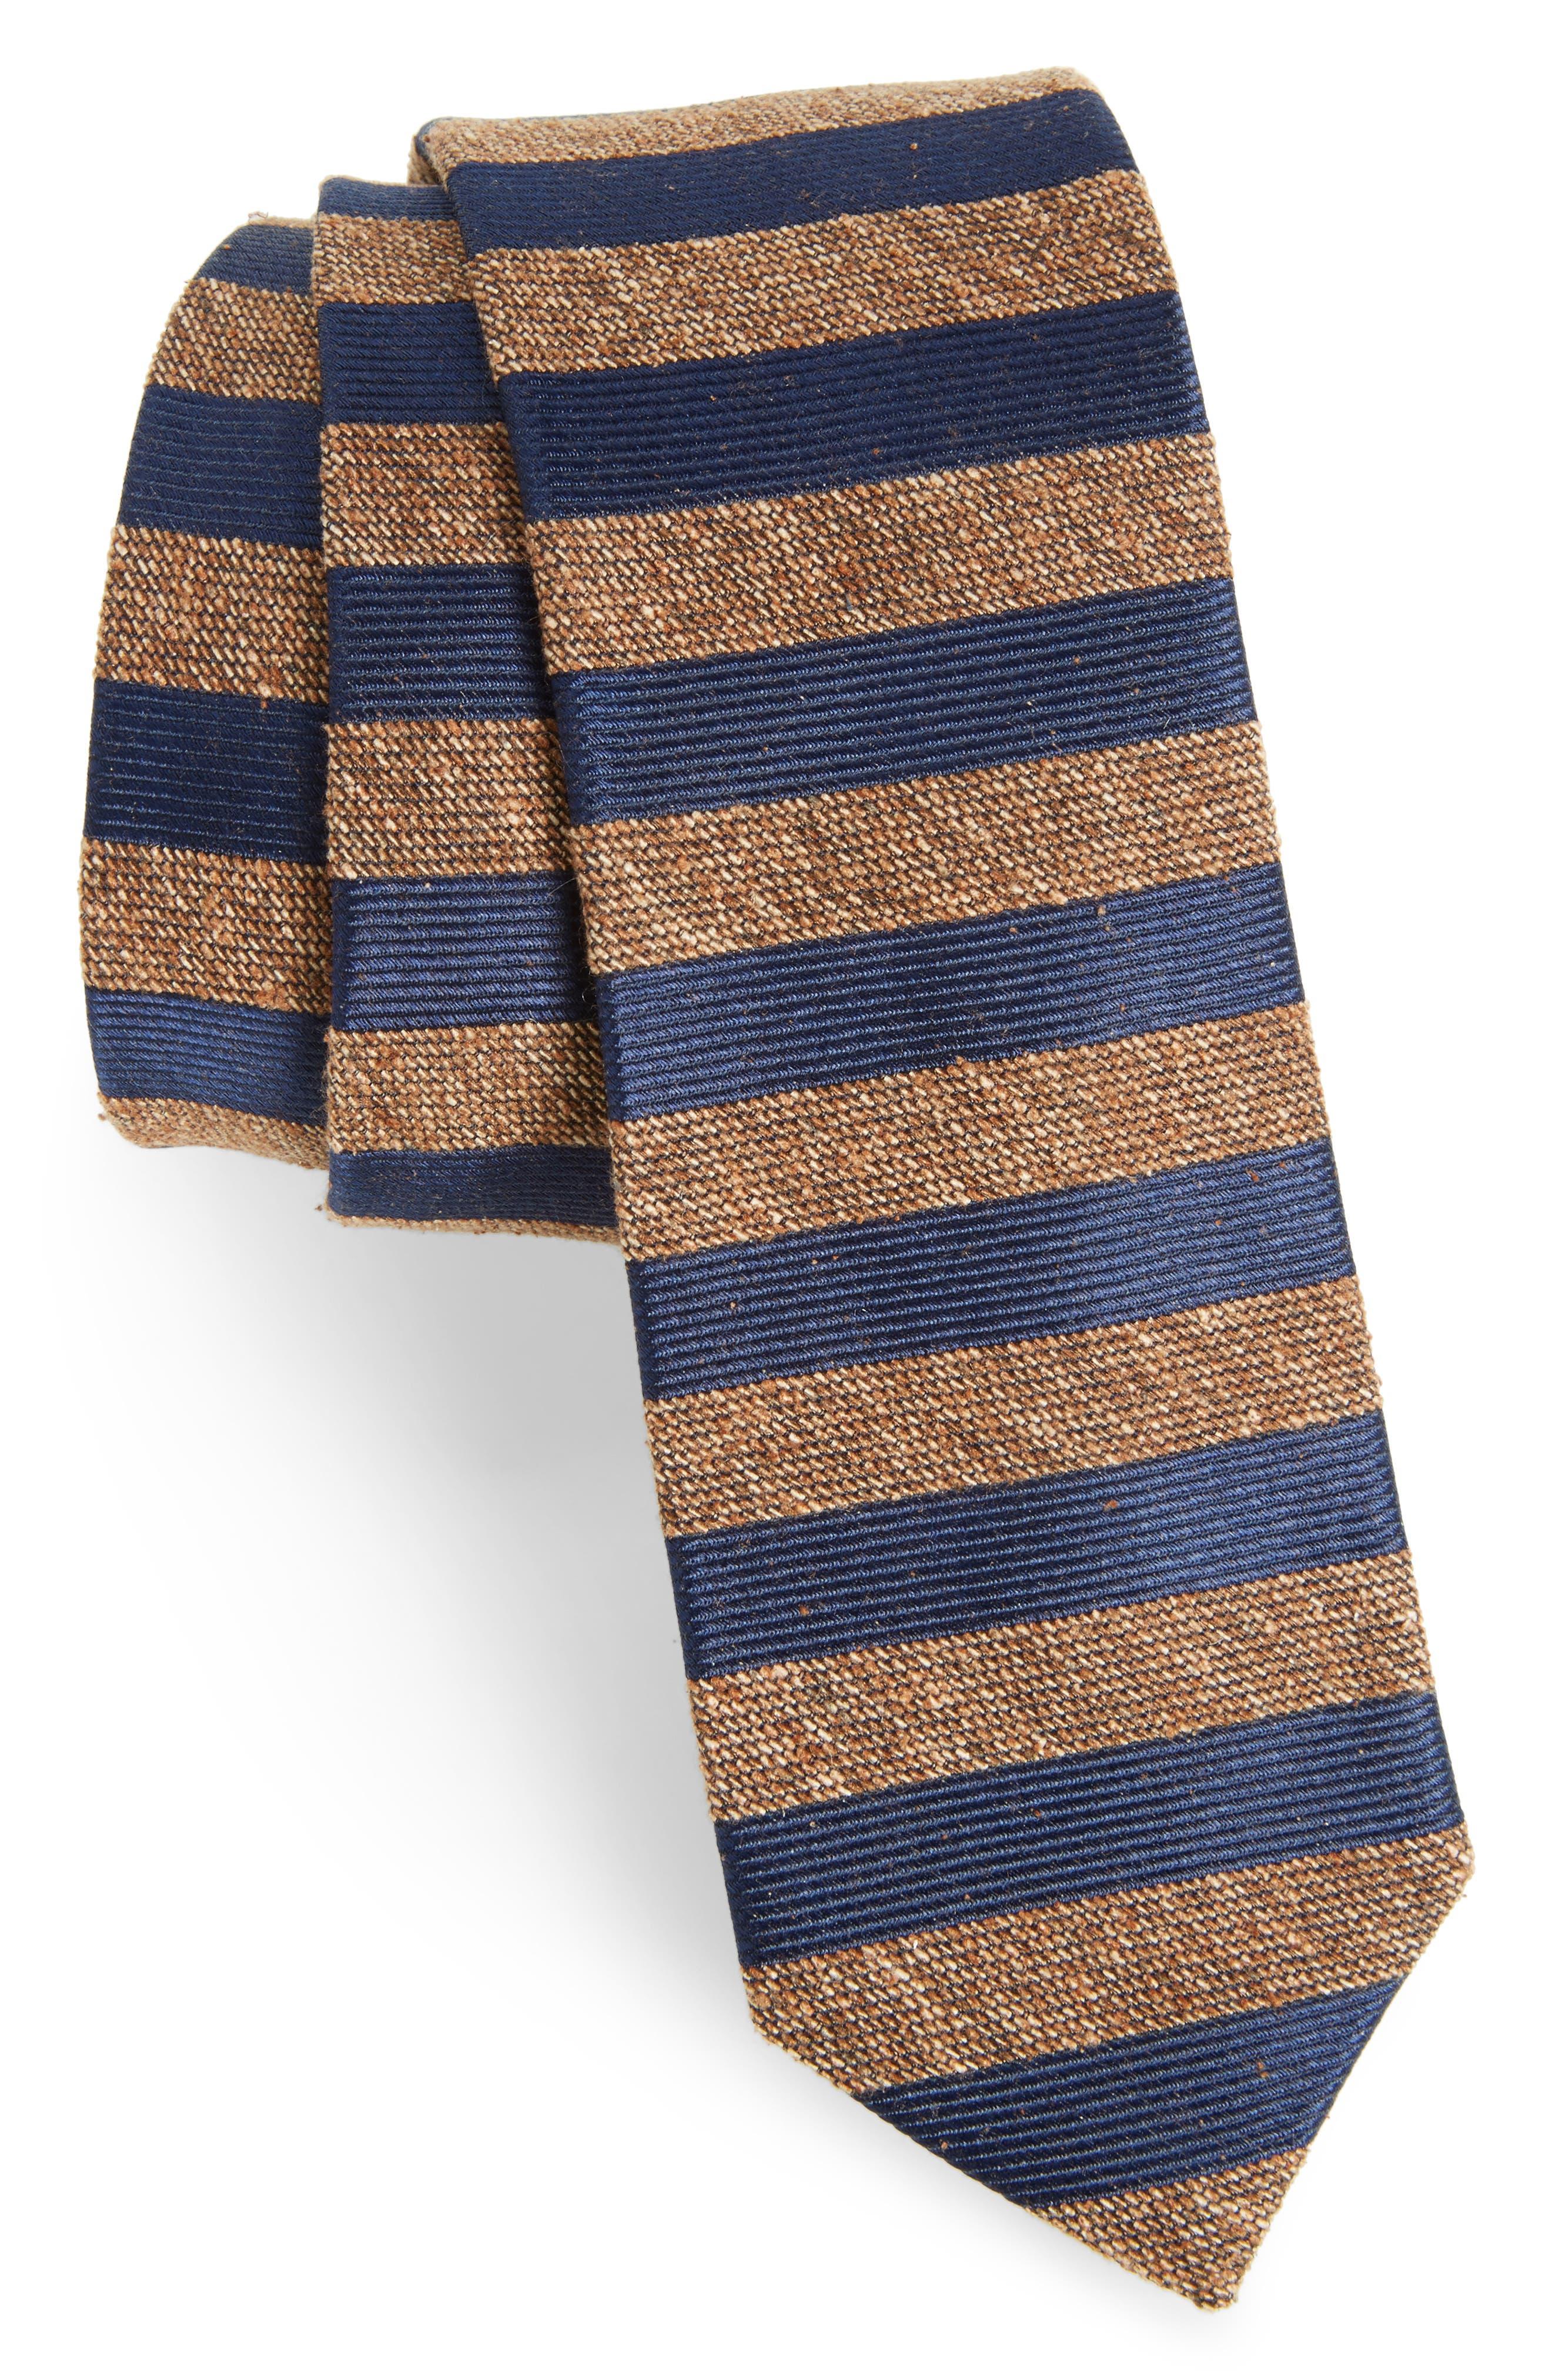 Meter Stripe Nep Silk Tie,                         Main,                         color, 200